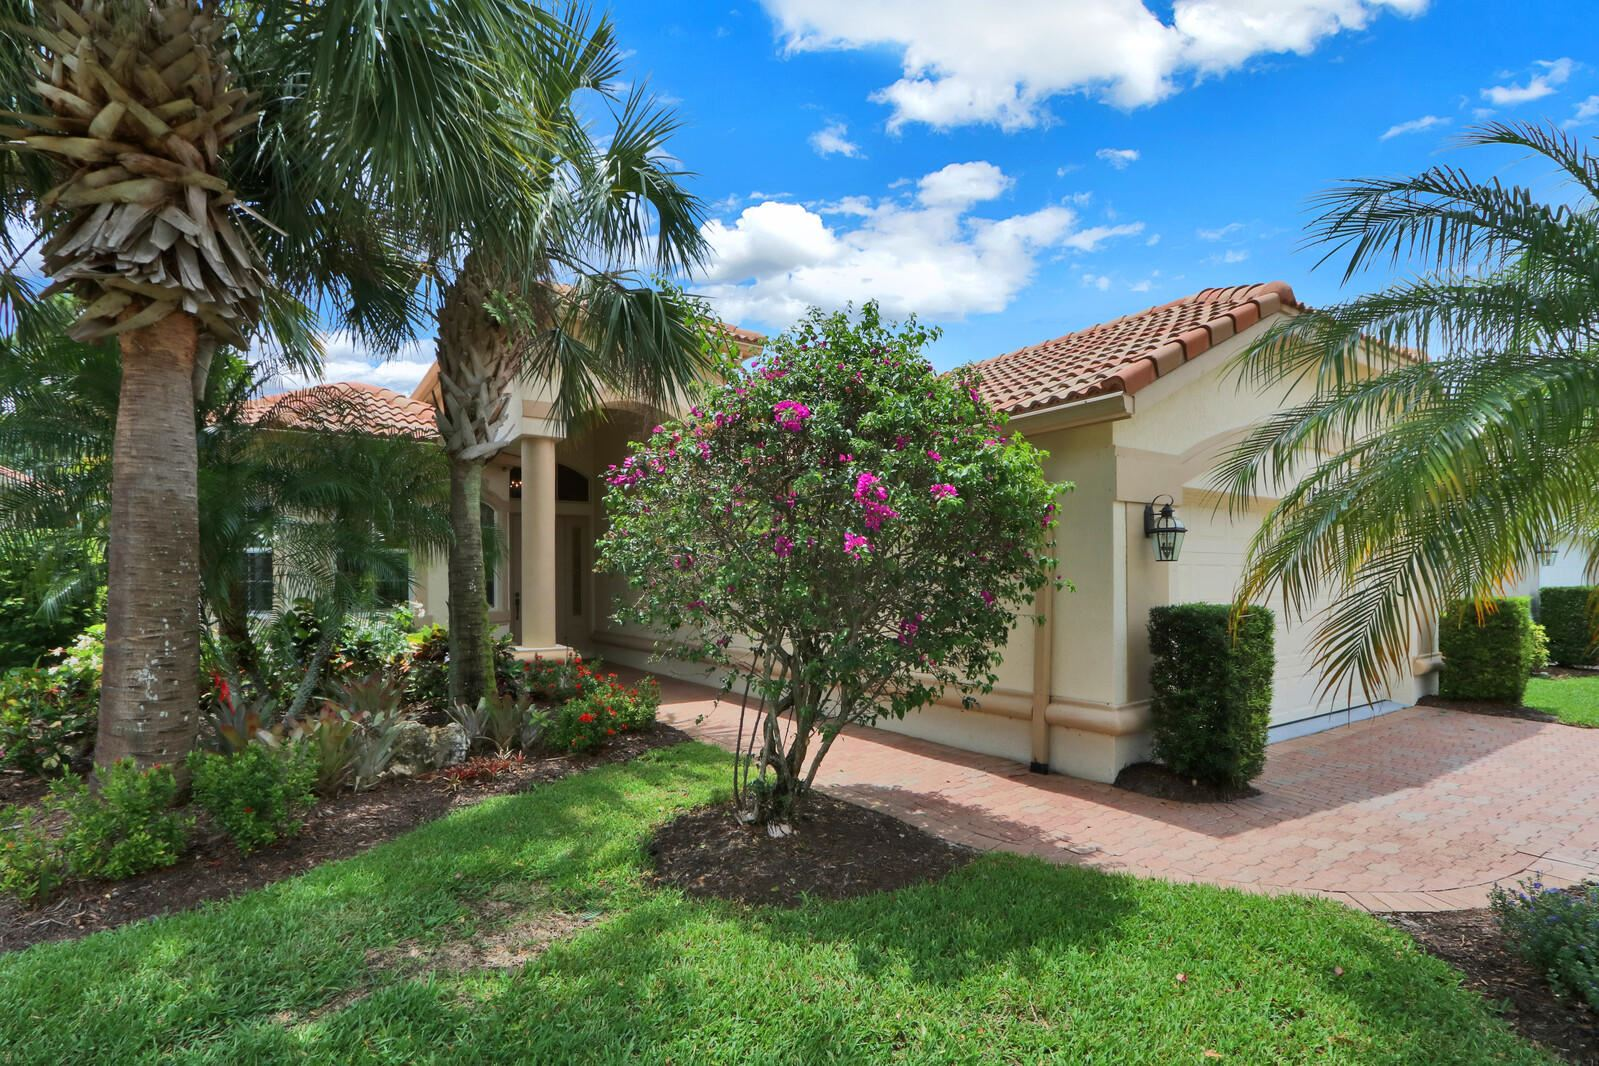 7652 Greenbrier Circle, Port Saint Lucie, FL 34986 - MLS#: RX-10716050